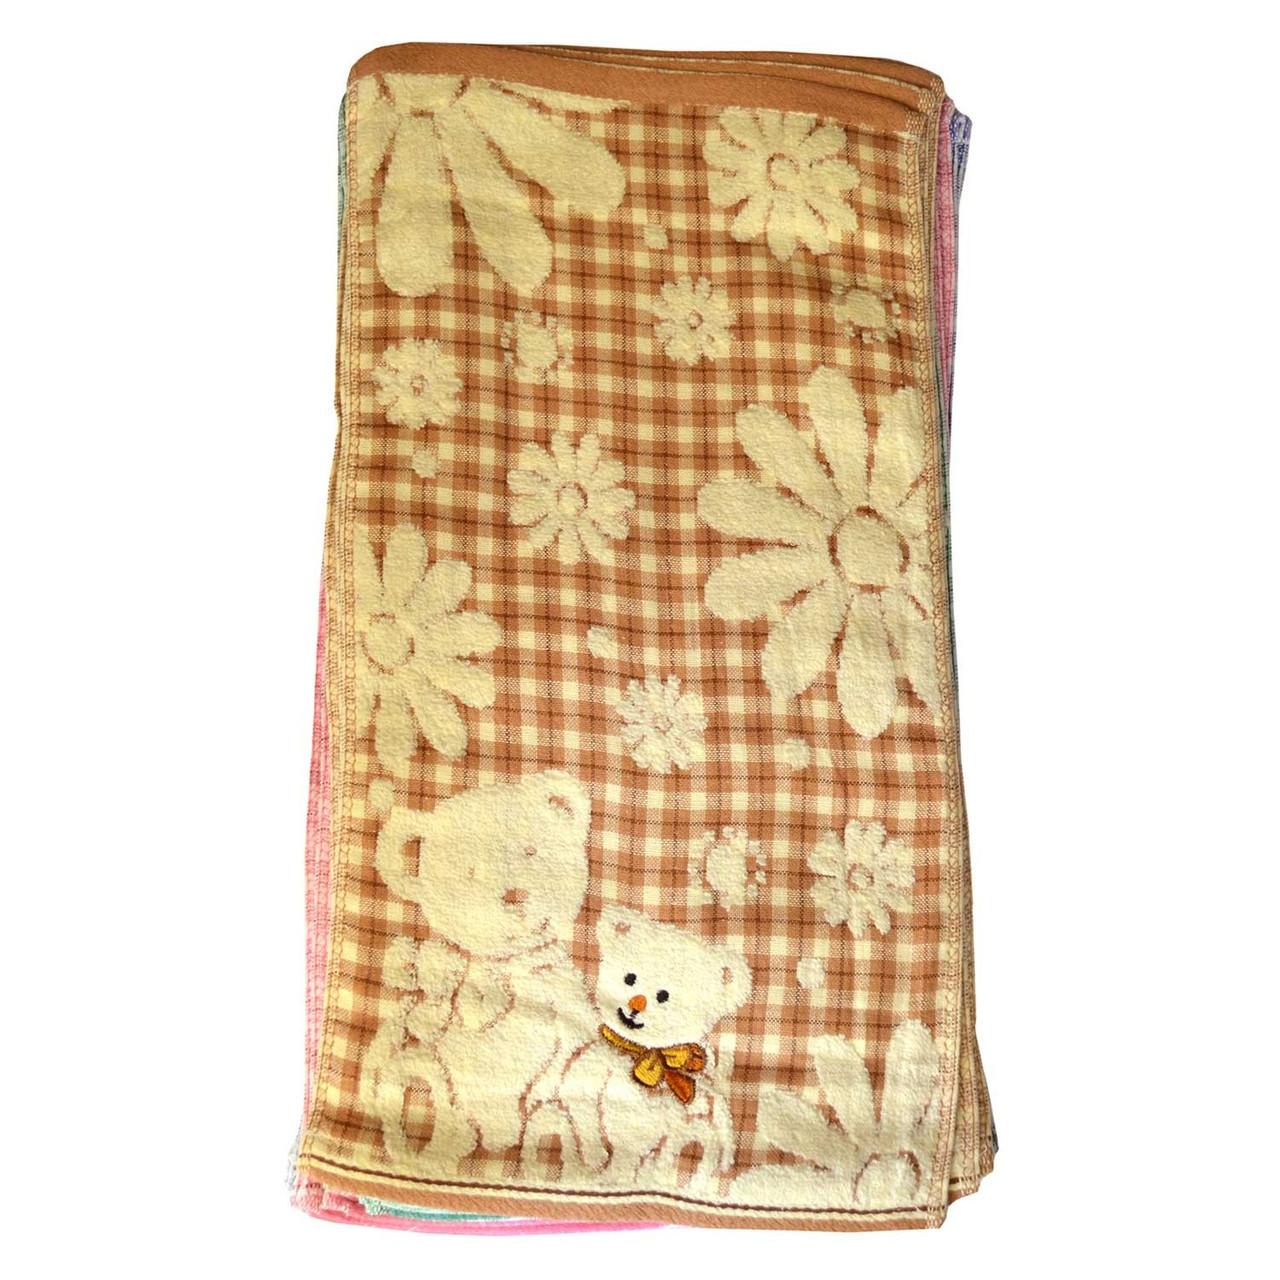 9f6fb3a28b2c Размер Кухонное полотенце Мишки лен с махрой ( ромашки ) хлопок 20 шт в уп.  Размер